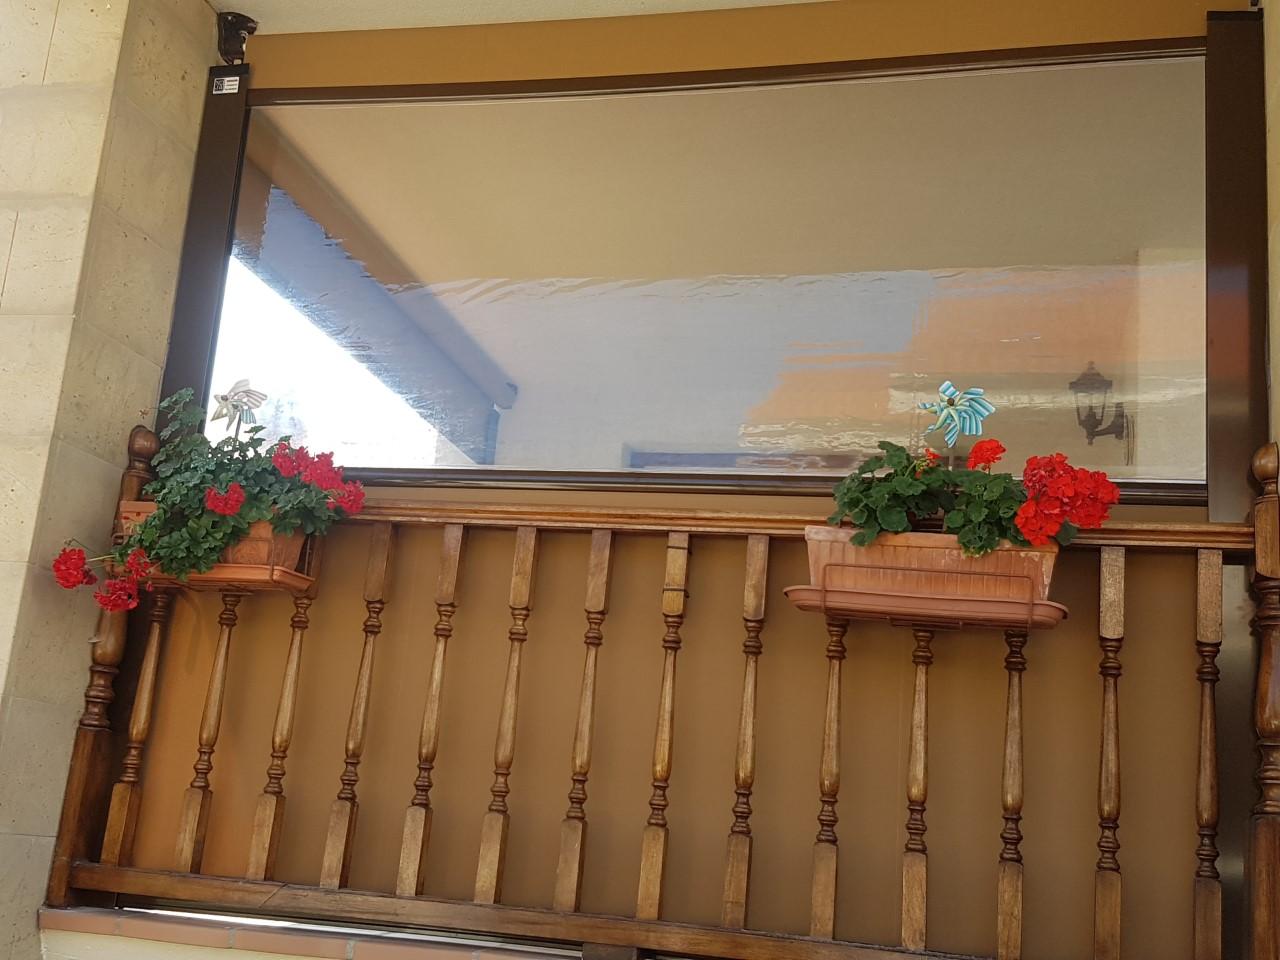 Thumbnail 20180918 131817 santander torrelavega cantabria bilbao vizcaya